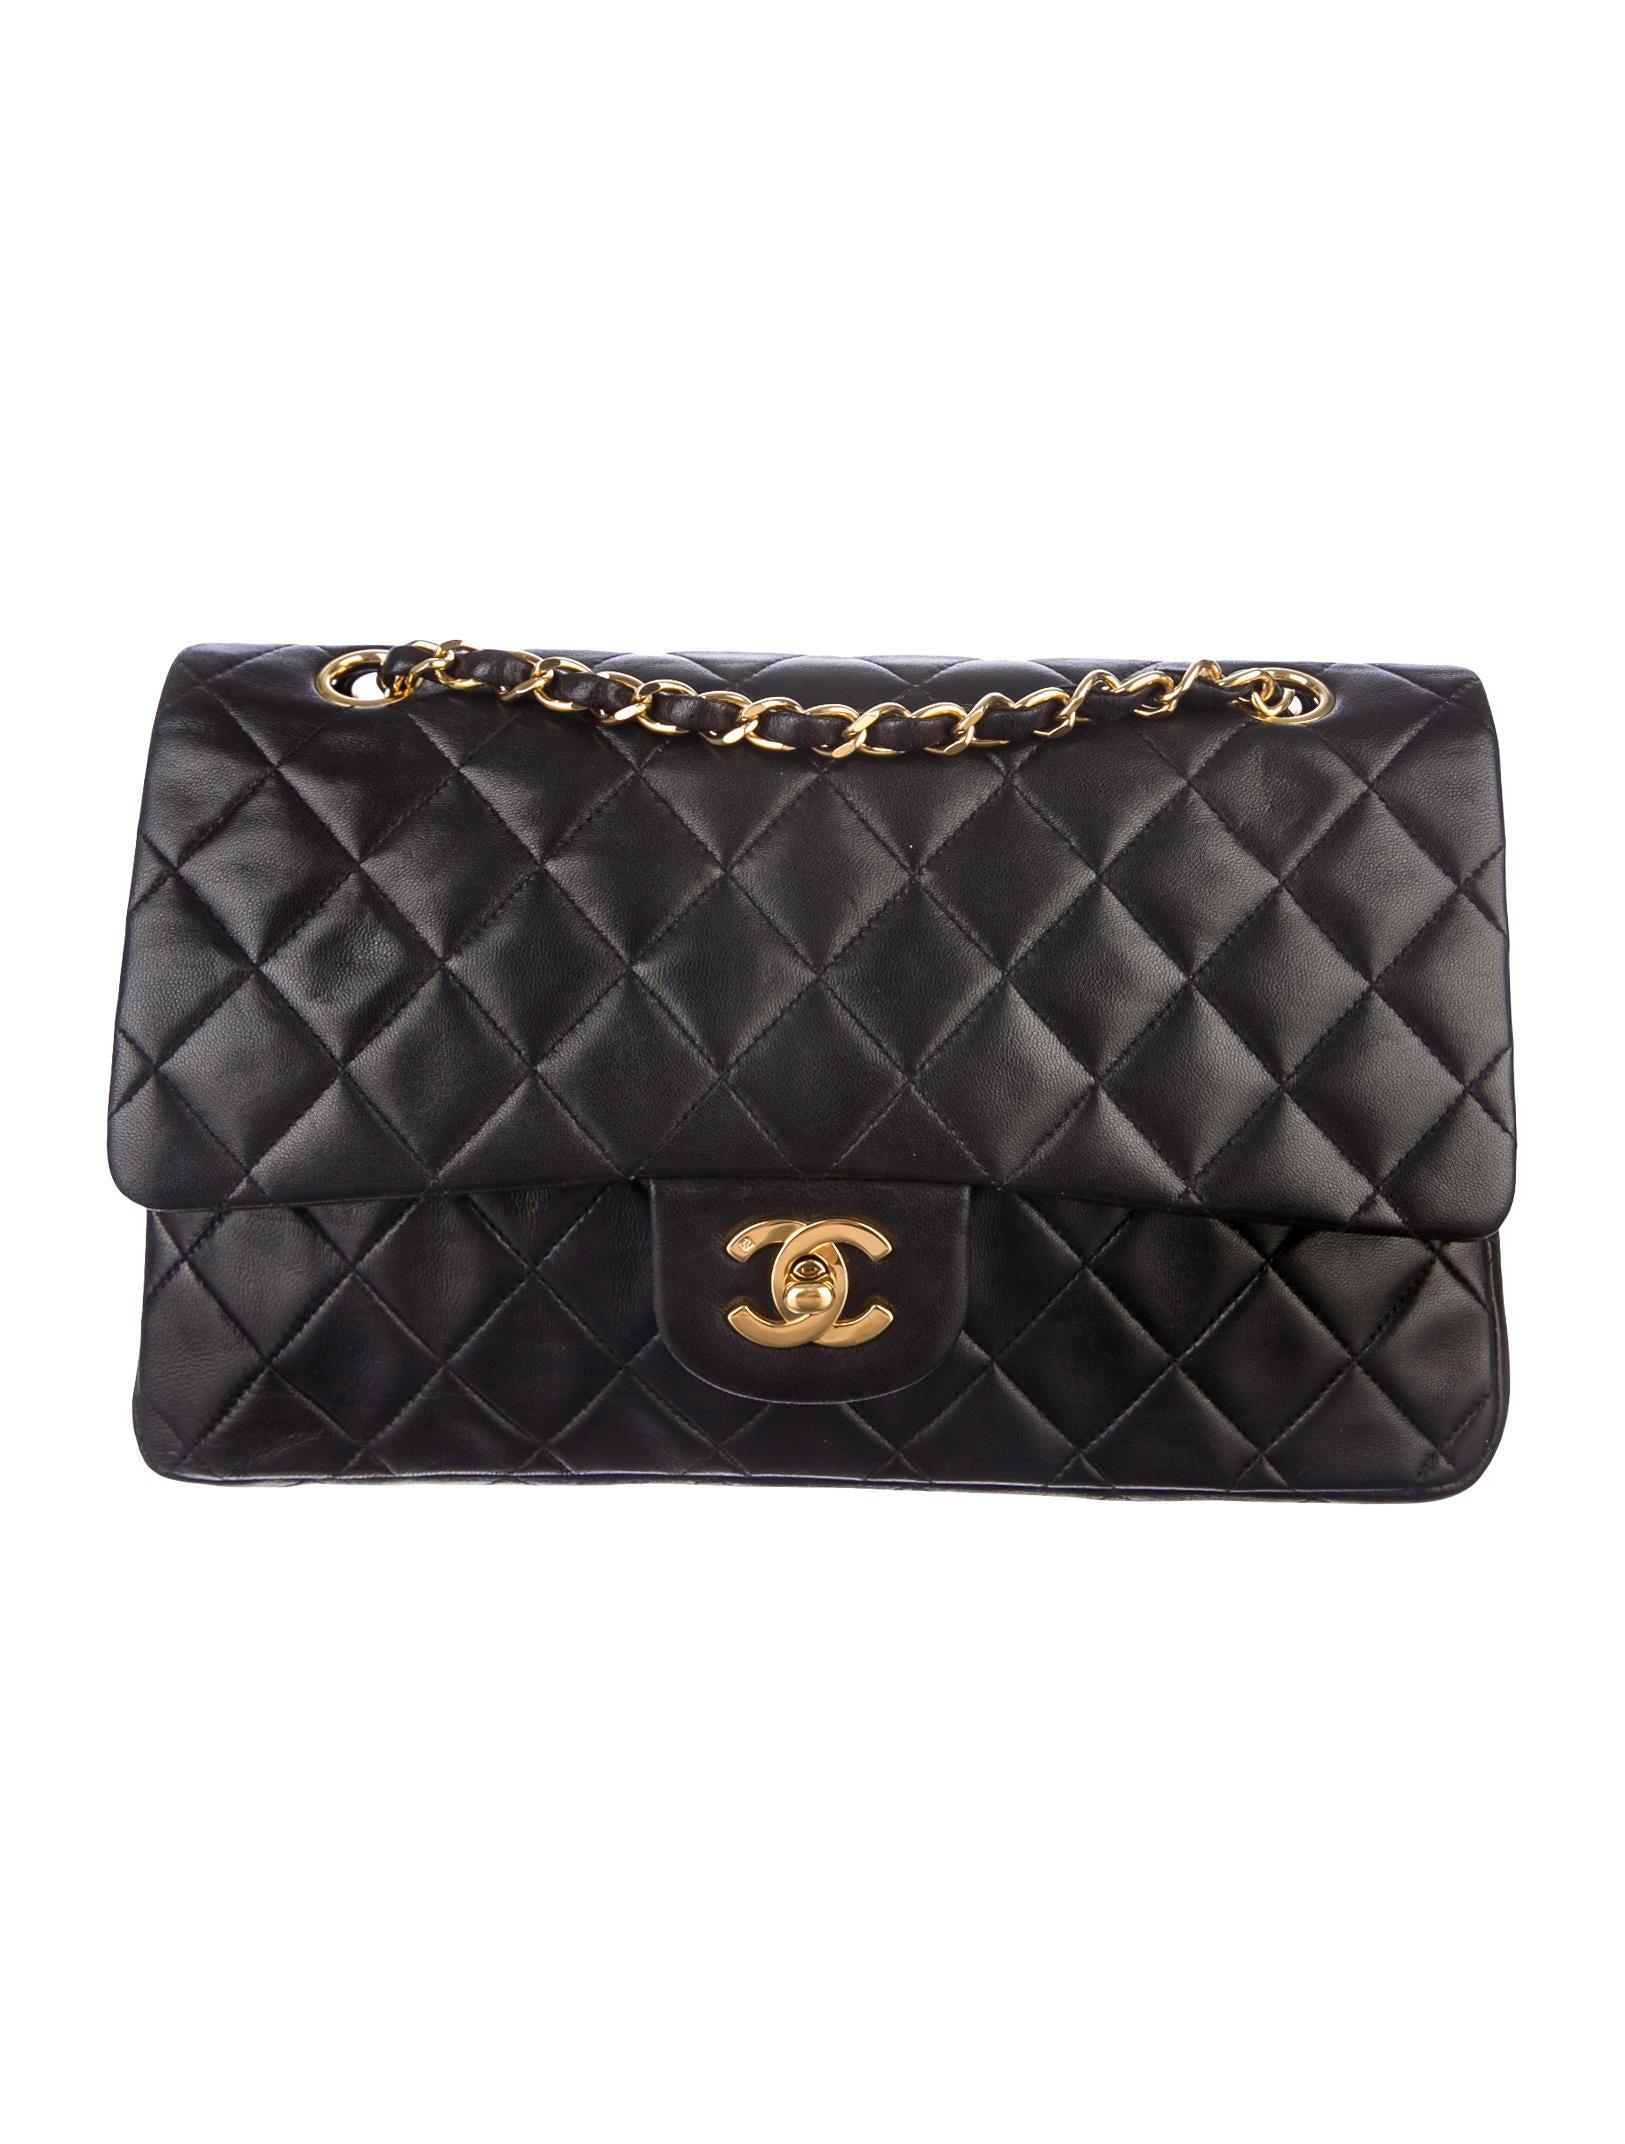 Chanel Väskor Vintage : Chanel vintage medium classic flap bag handbags